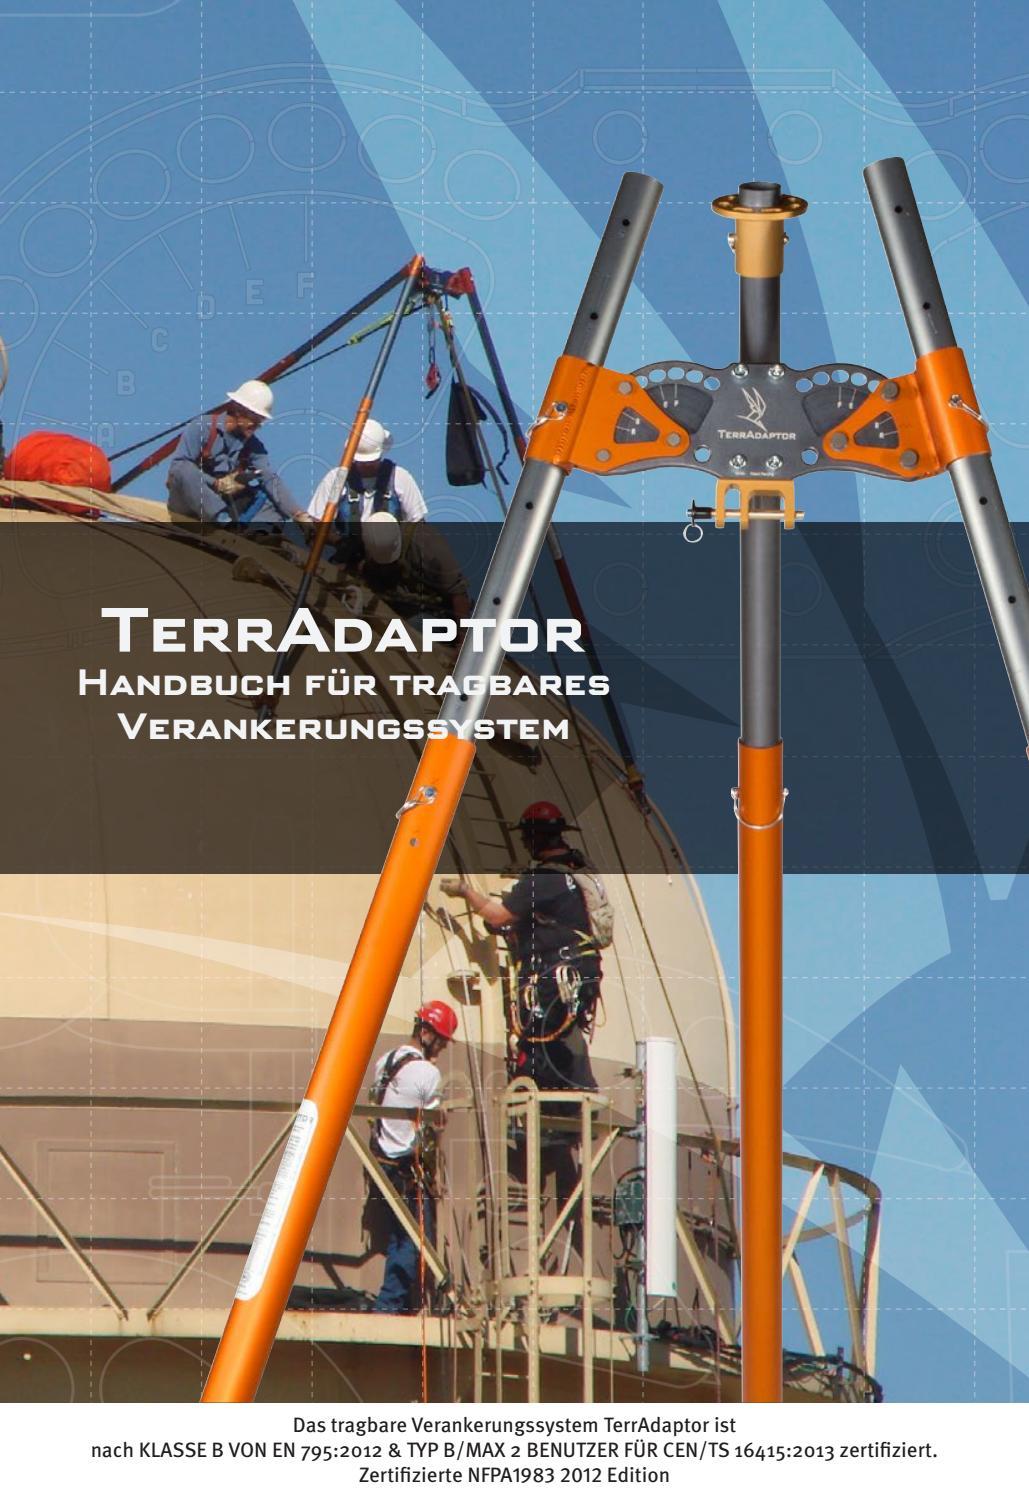 Terradaptor Manual - German by SMC Gear - issuu